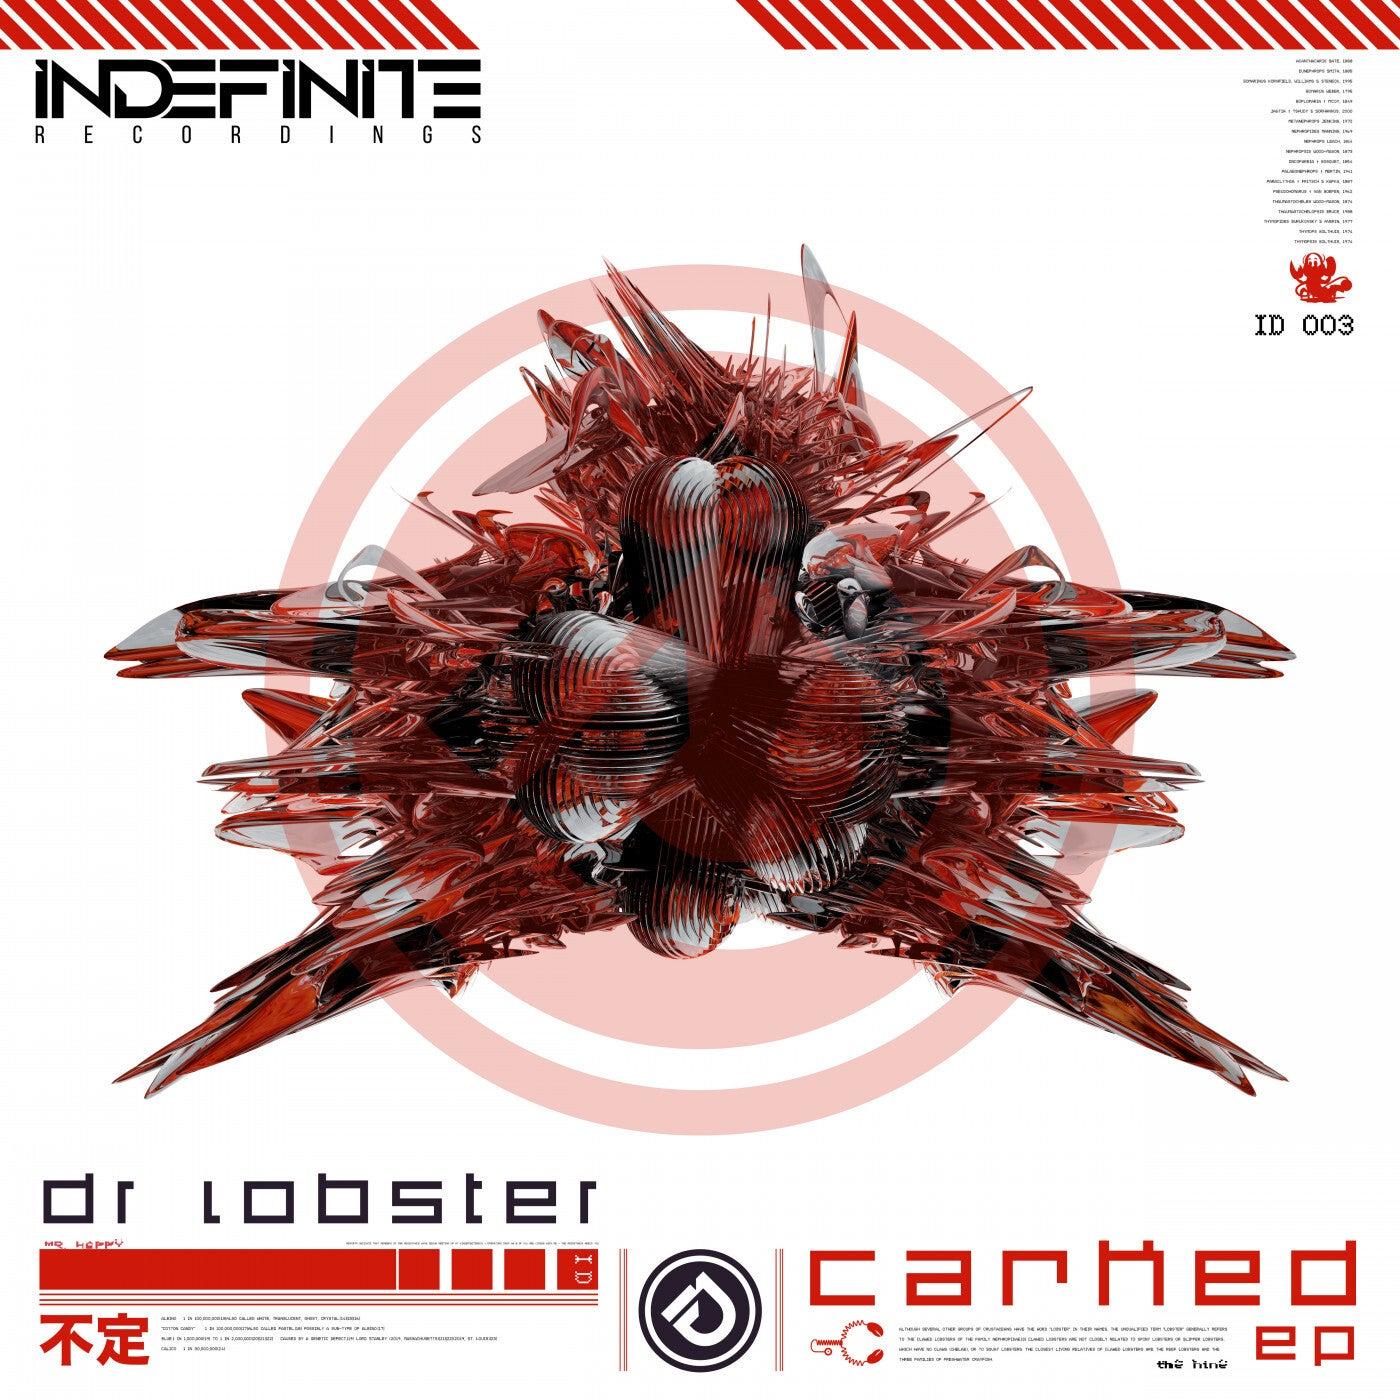 Carked (Original Mix)